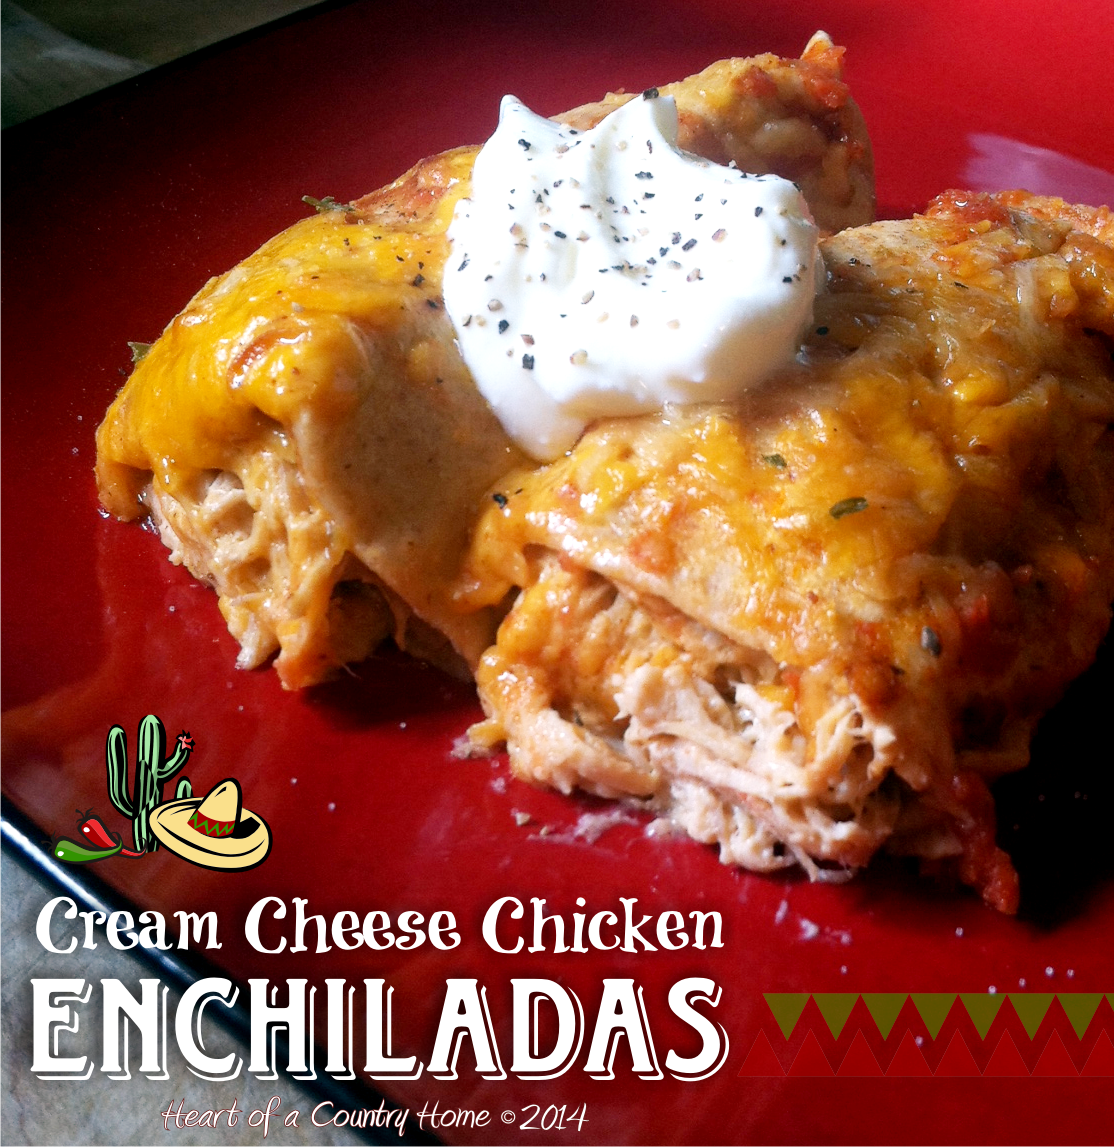 Cream Cheese Chicken Enchiladas Low Carb Cream Cheese Chicken Cream Cheese Chicken Enchiladas Low Carb Enchiladas